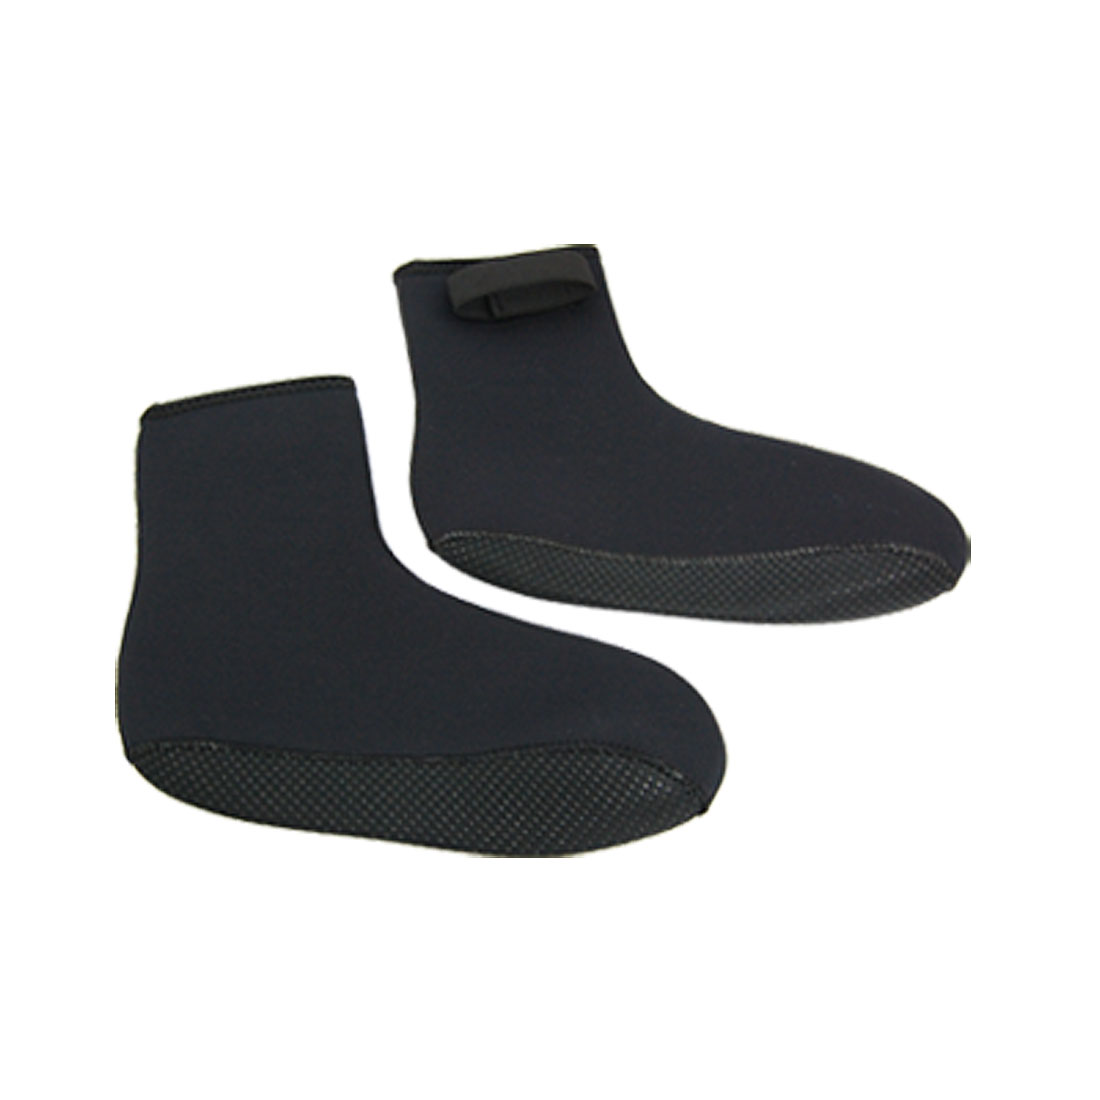 2 Pcs Black Nonslip Sole Neoprene Diving Boots Diver Socks